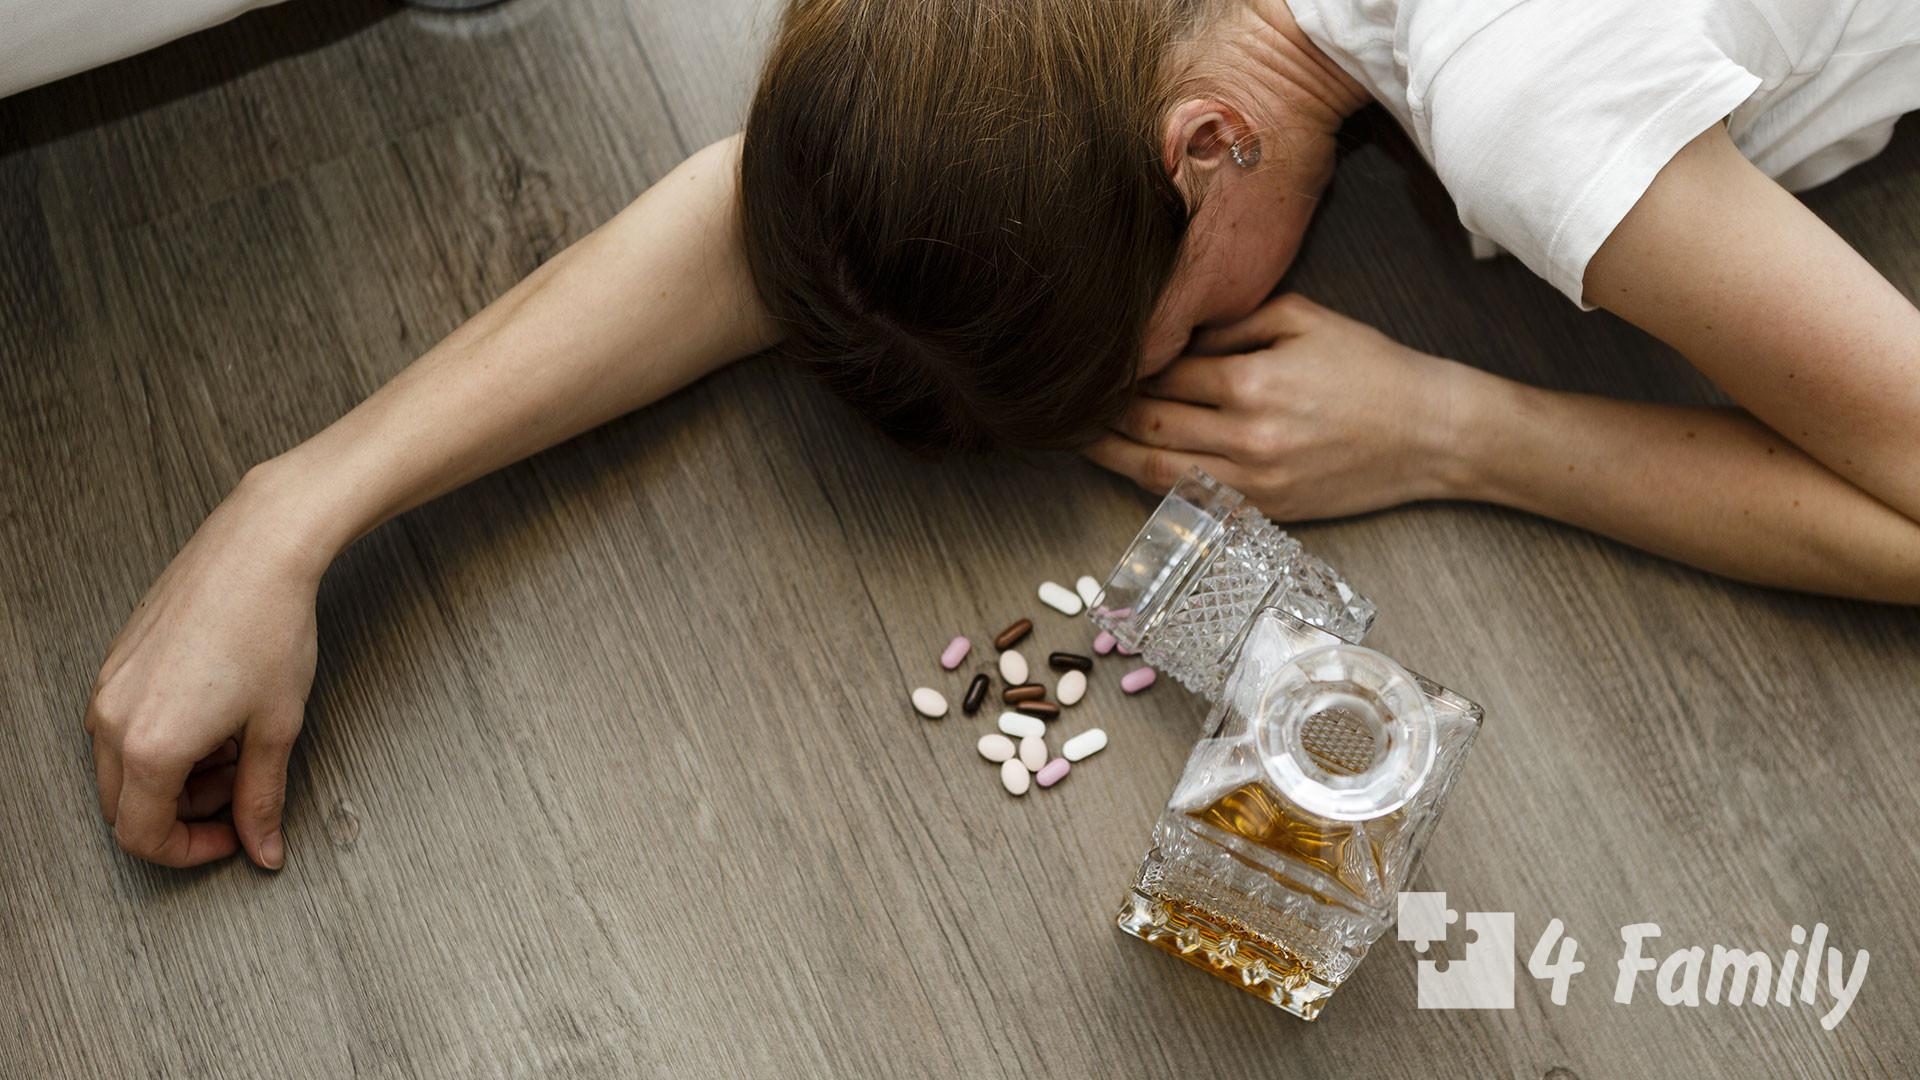 4family Антибиотики и алкоголь